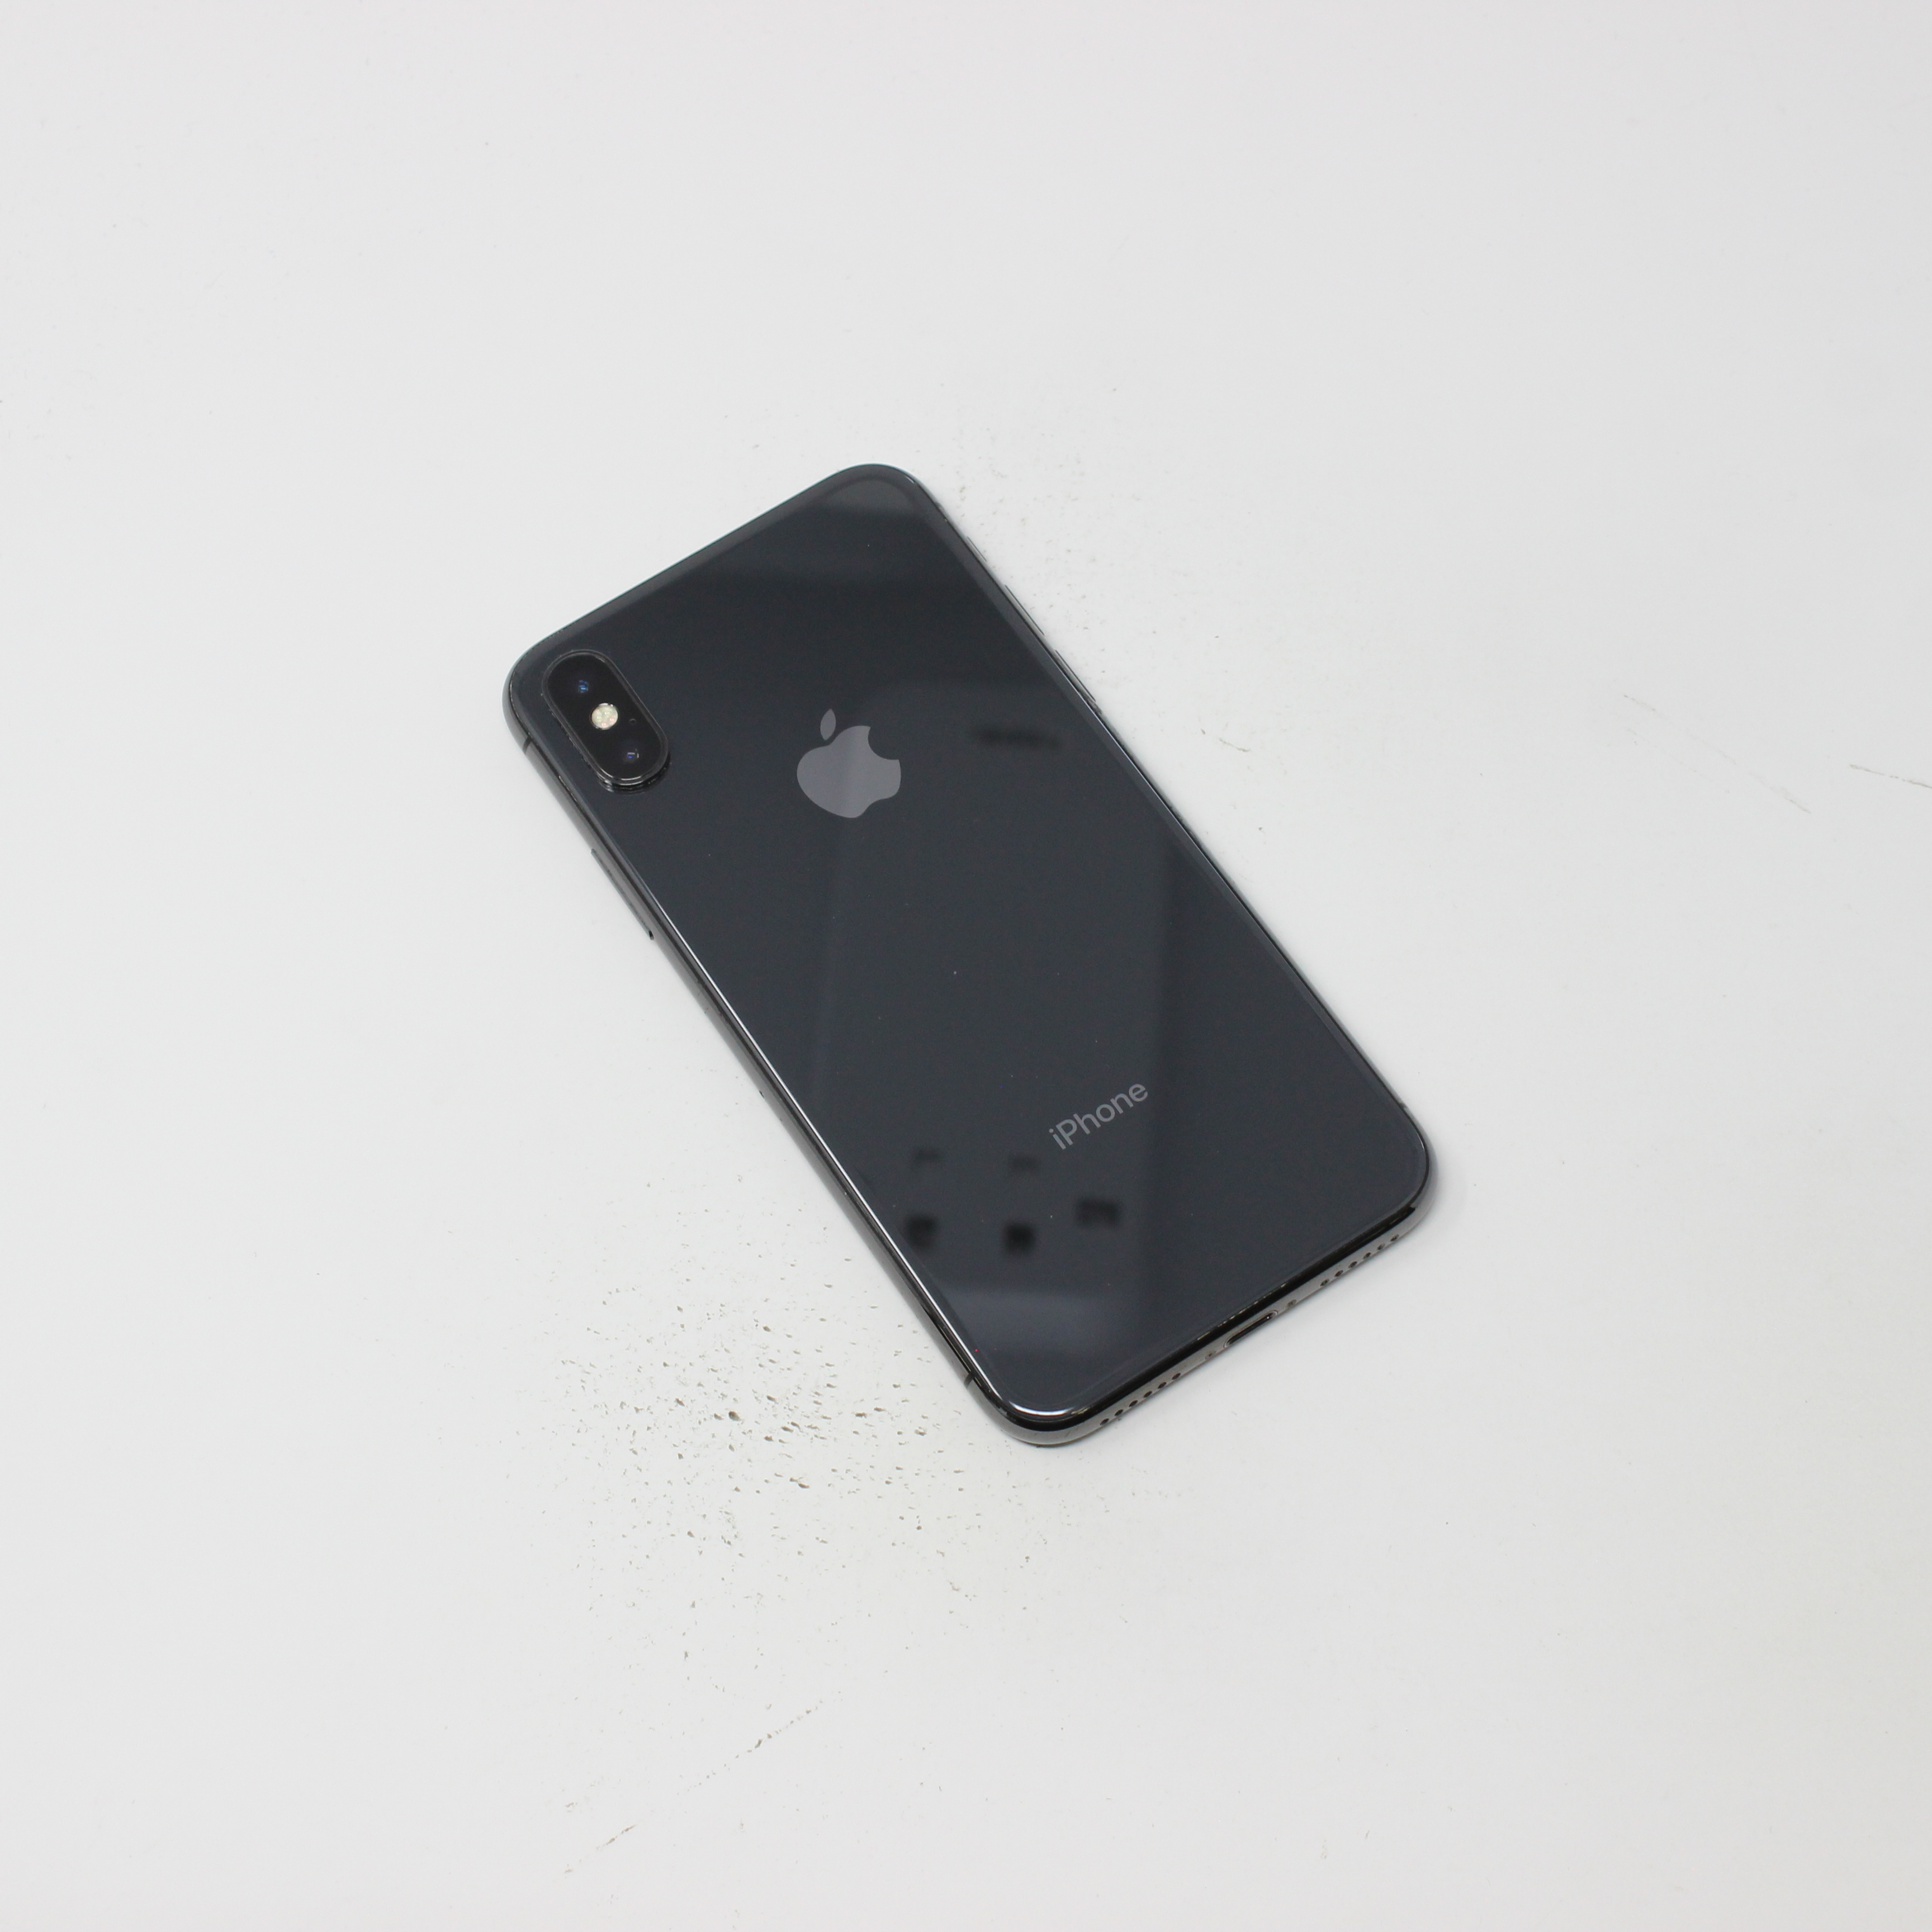 iPhone X 256GB Space Gray - T-Mobile photo 3 | UpTradeit.com